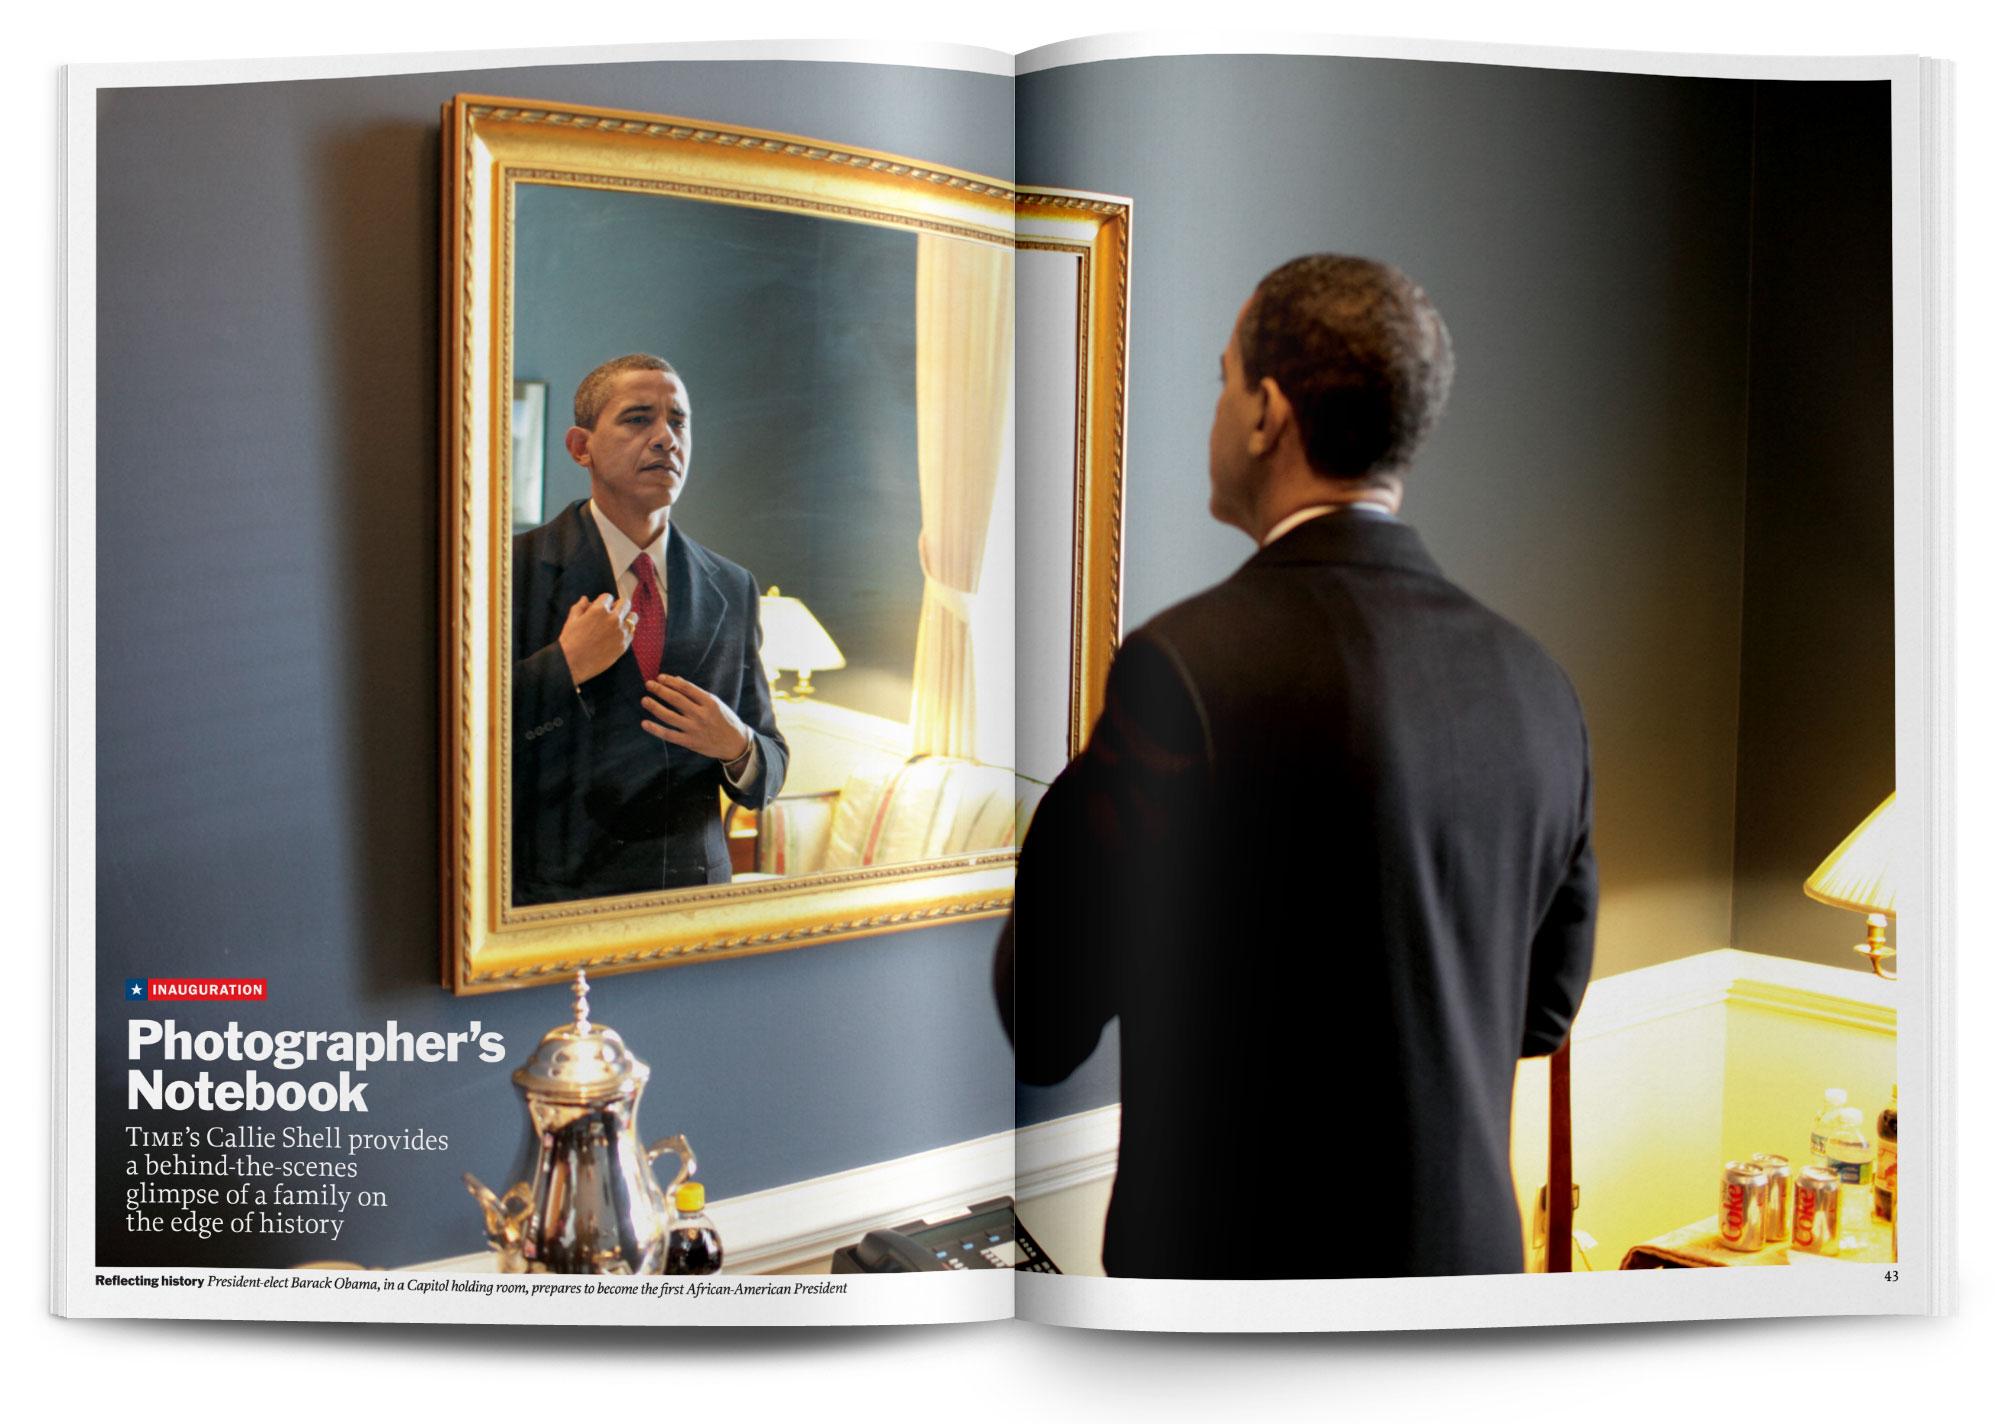 layouts.obamainaug3.jpg